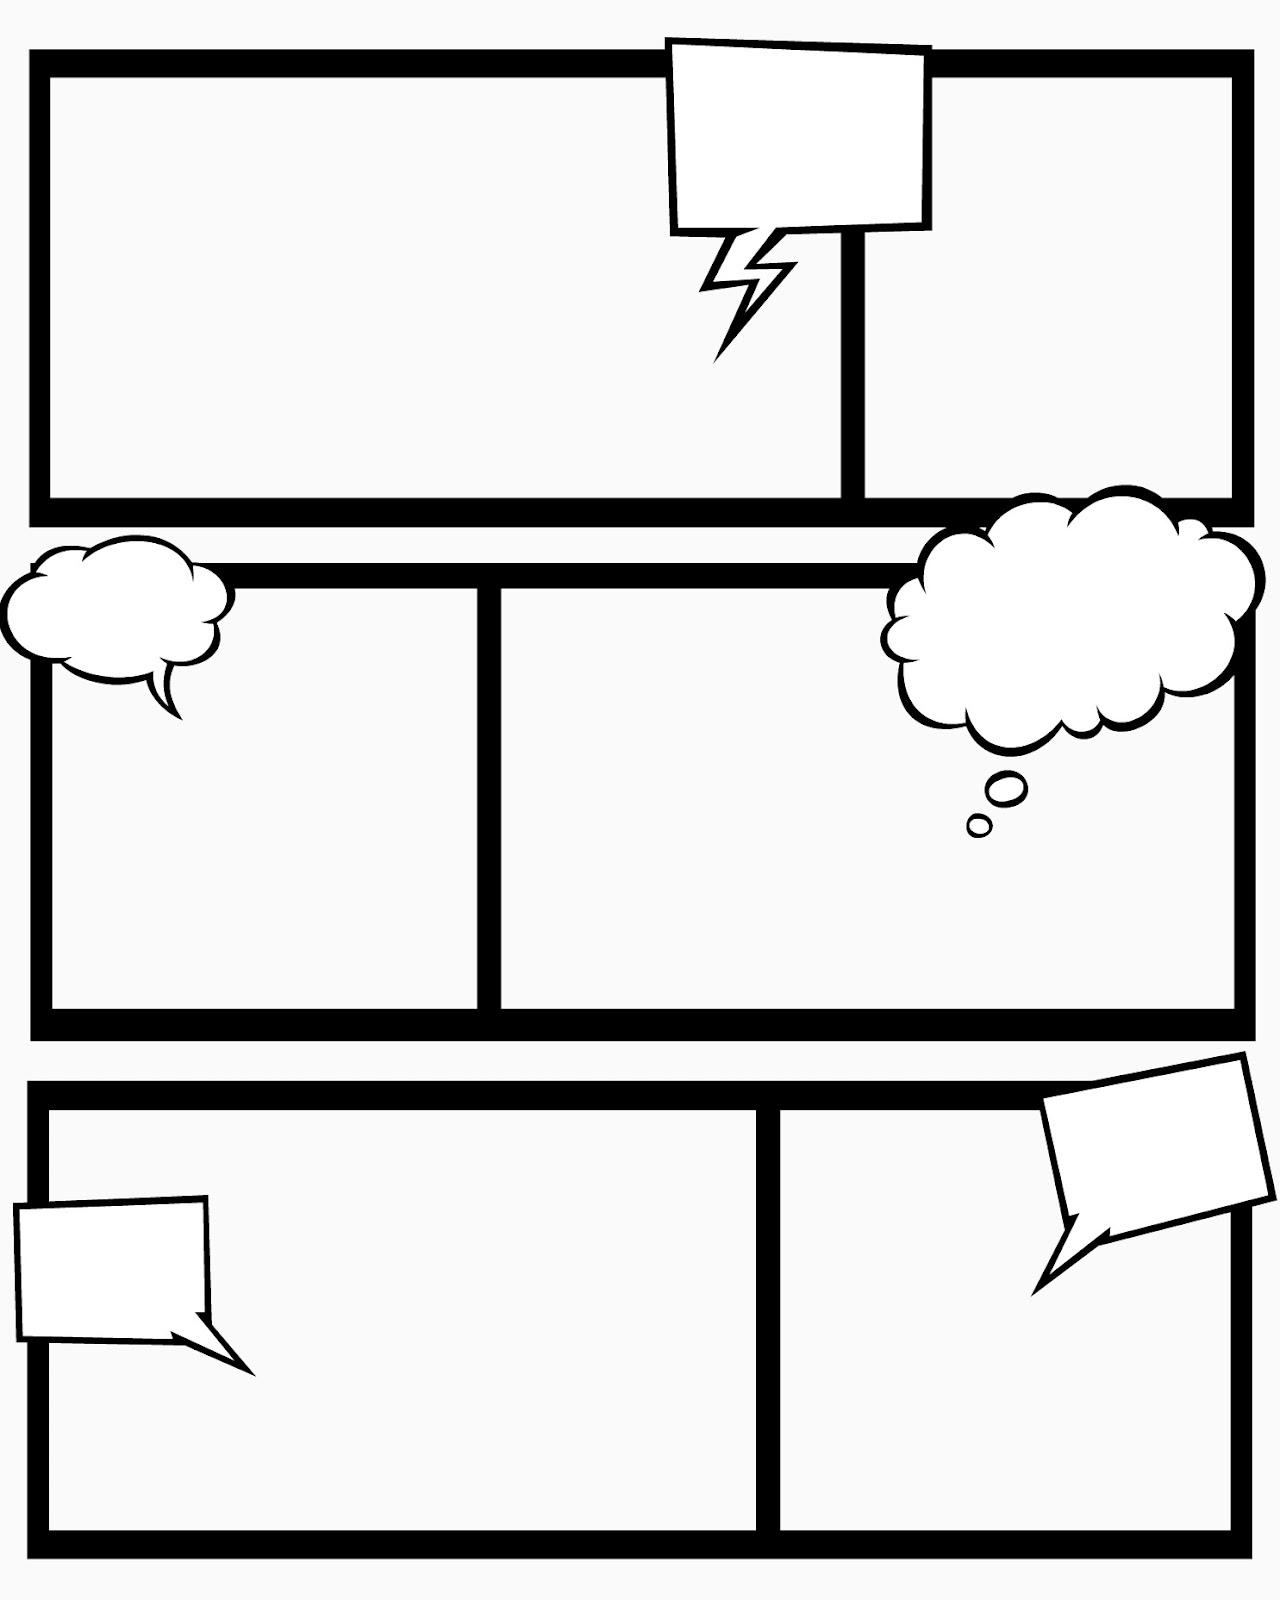 See Comic Strip Template Printable, Comic Strip Templates & Comic Book ...